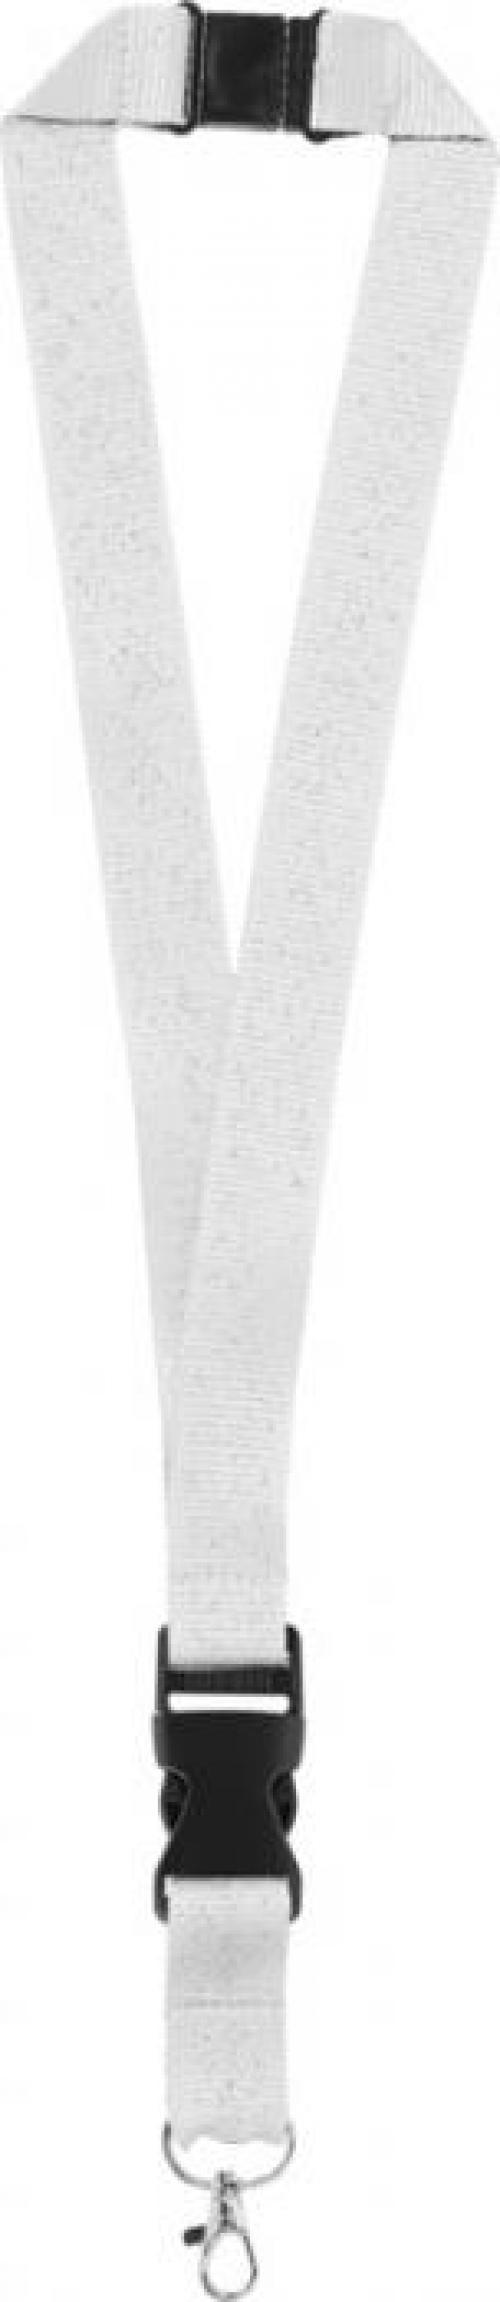 Cordón identificativo con hebilla separable Yogi